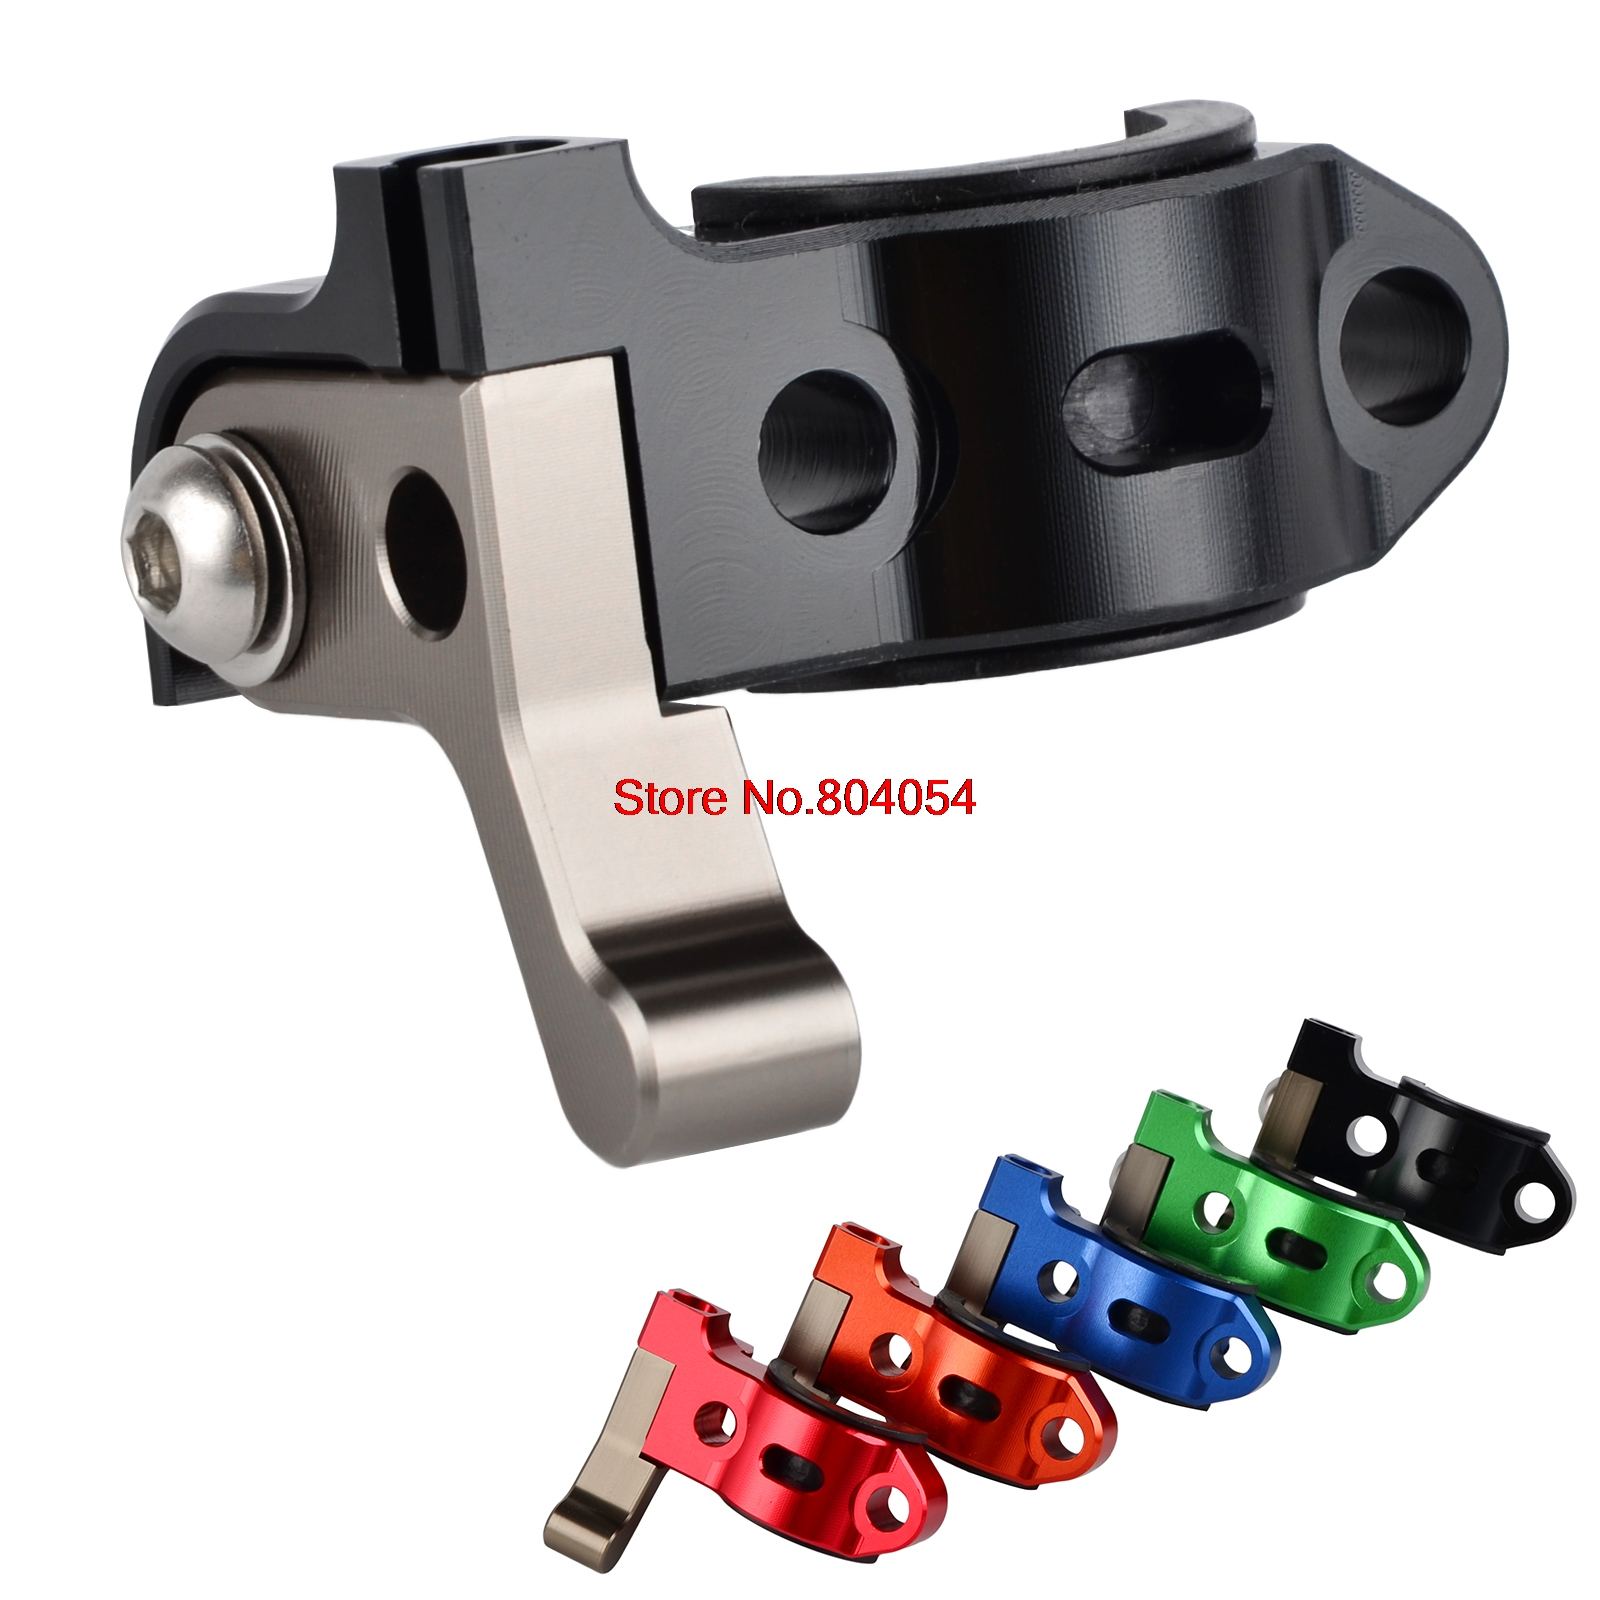 Rotating Bar Clamp Hot Start Lever For Suzuki RM65 RM80 RM85 RM100 RM125 RM250 RMZ250 RMZ450 DR-Z400 DRZ400 DR-Z400E 450 hot start